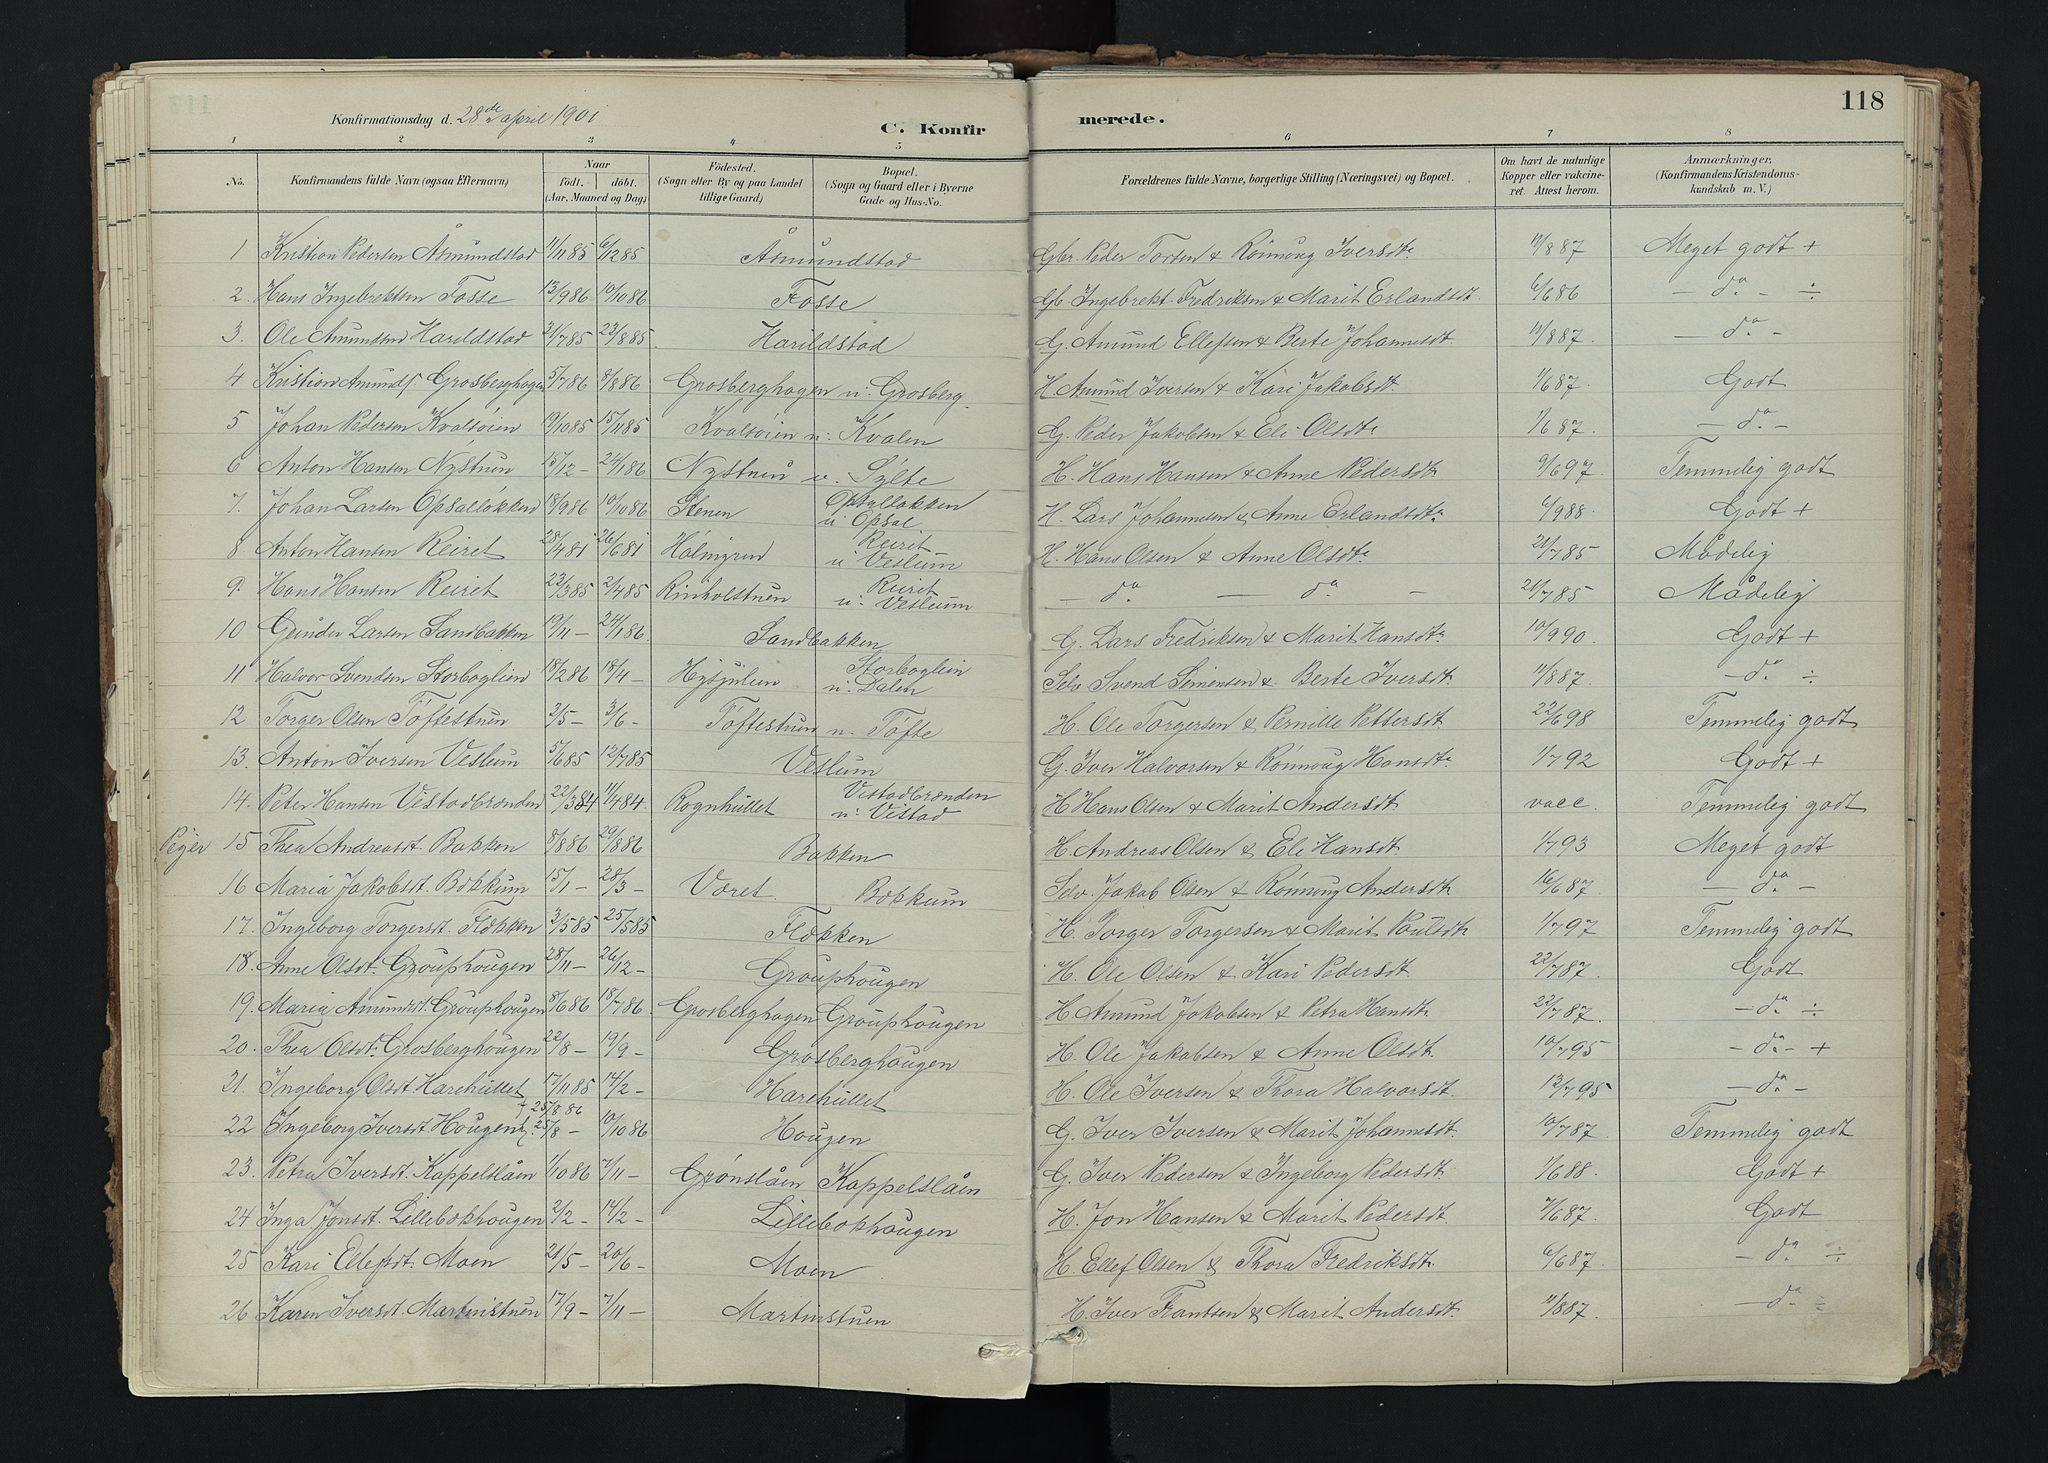 SAH, Nord-Fron prestekontor, Ministerialbok nr. 5, 1884-1914, s. 118